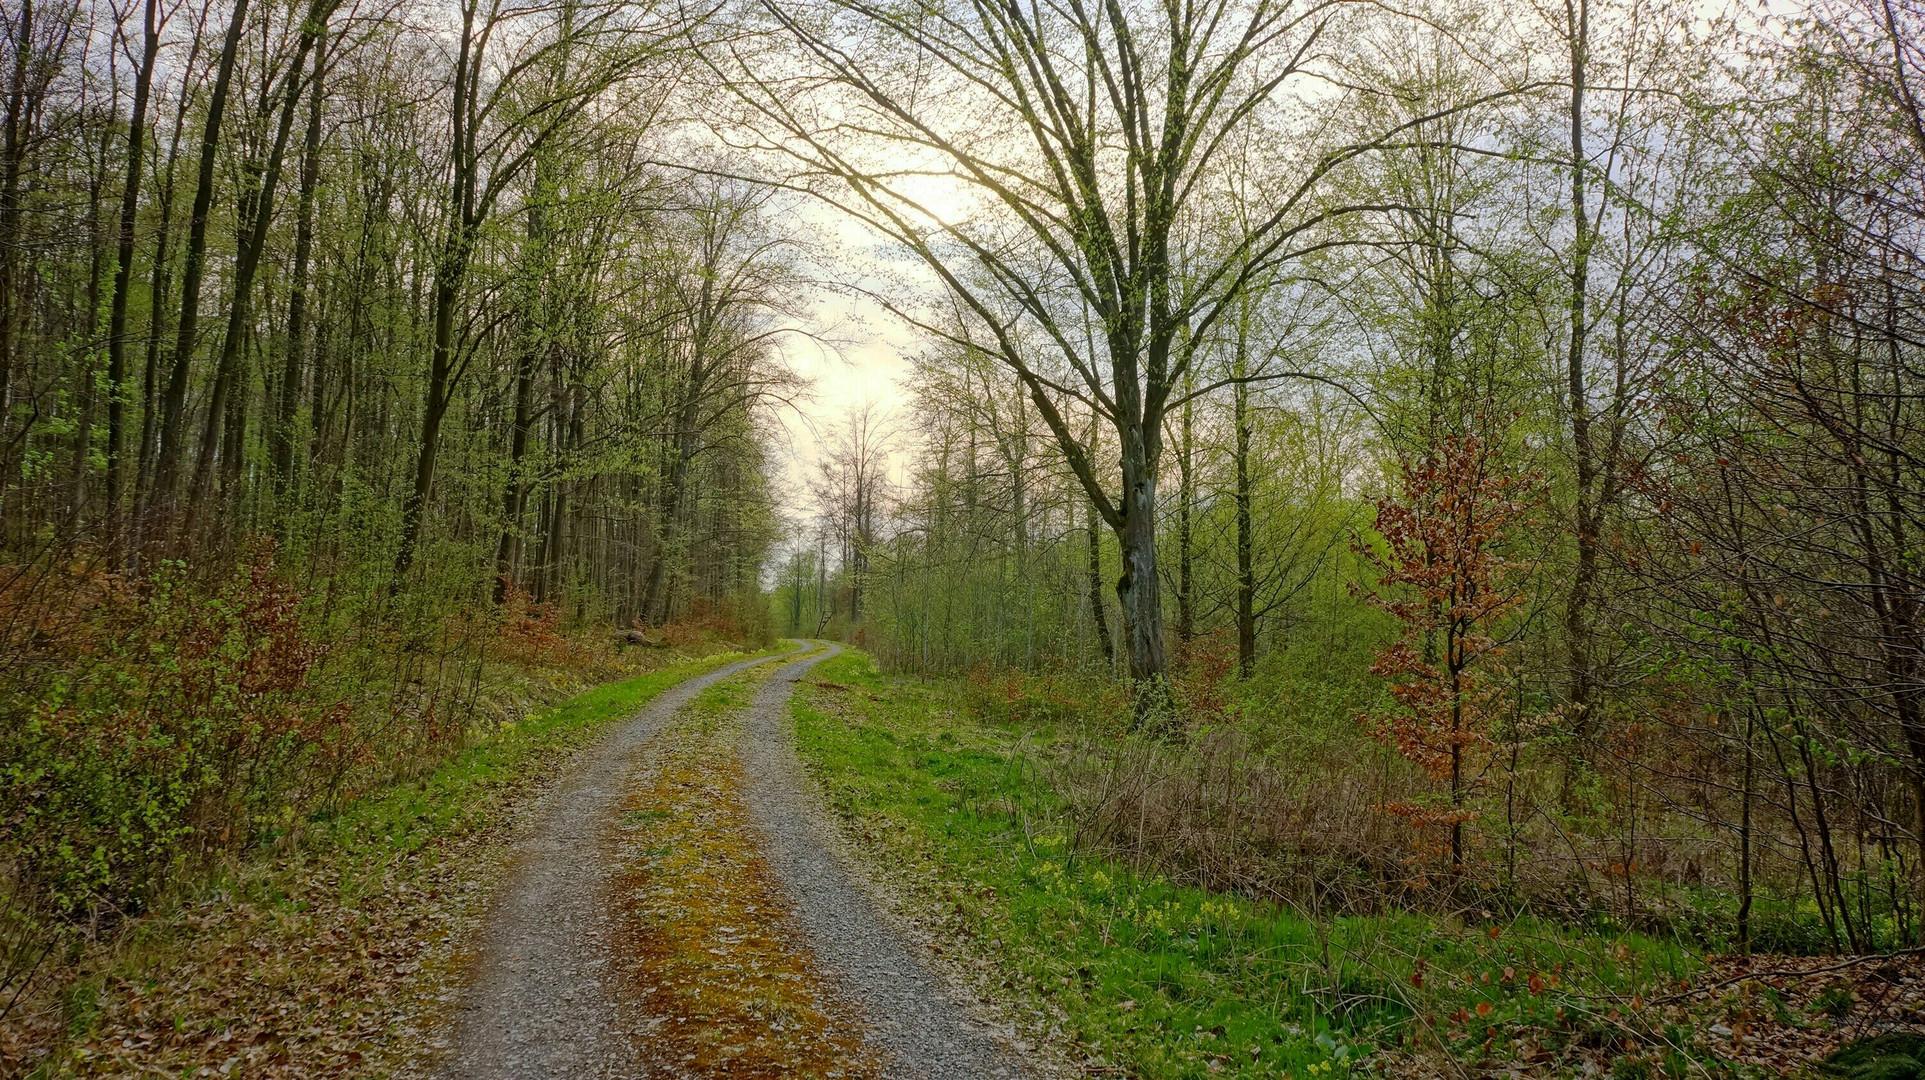 Waldweg (camino forestal))